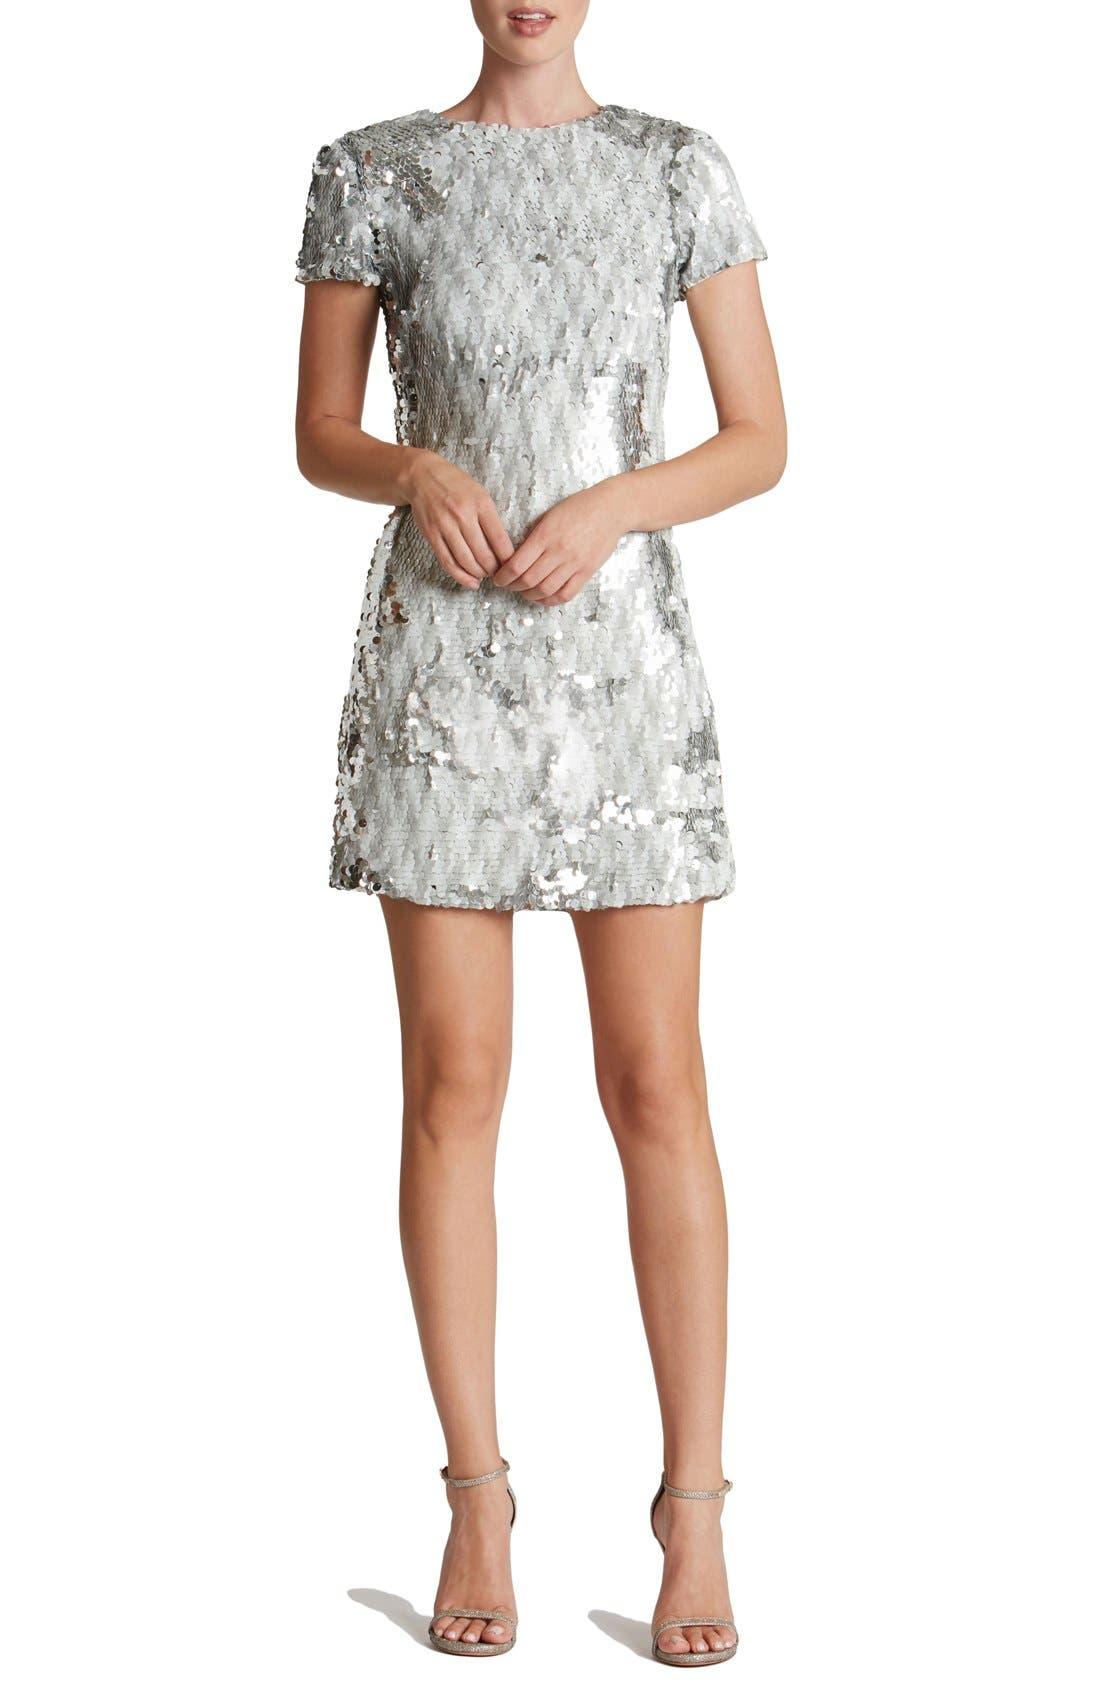 Alternate Image 1 Selected - Dress the Population 'Ellen' Sequin Sheath Dress